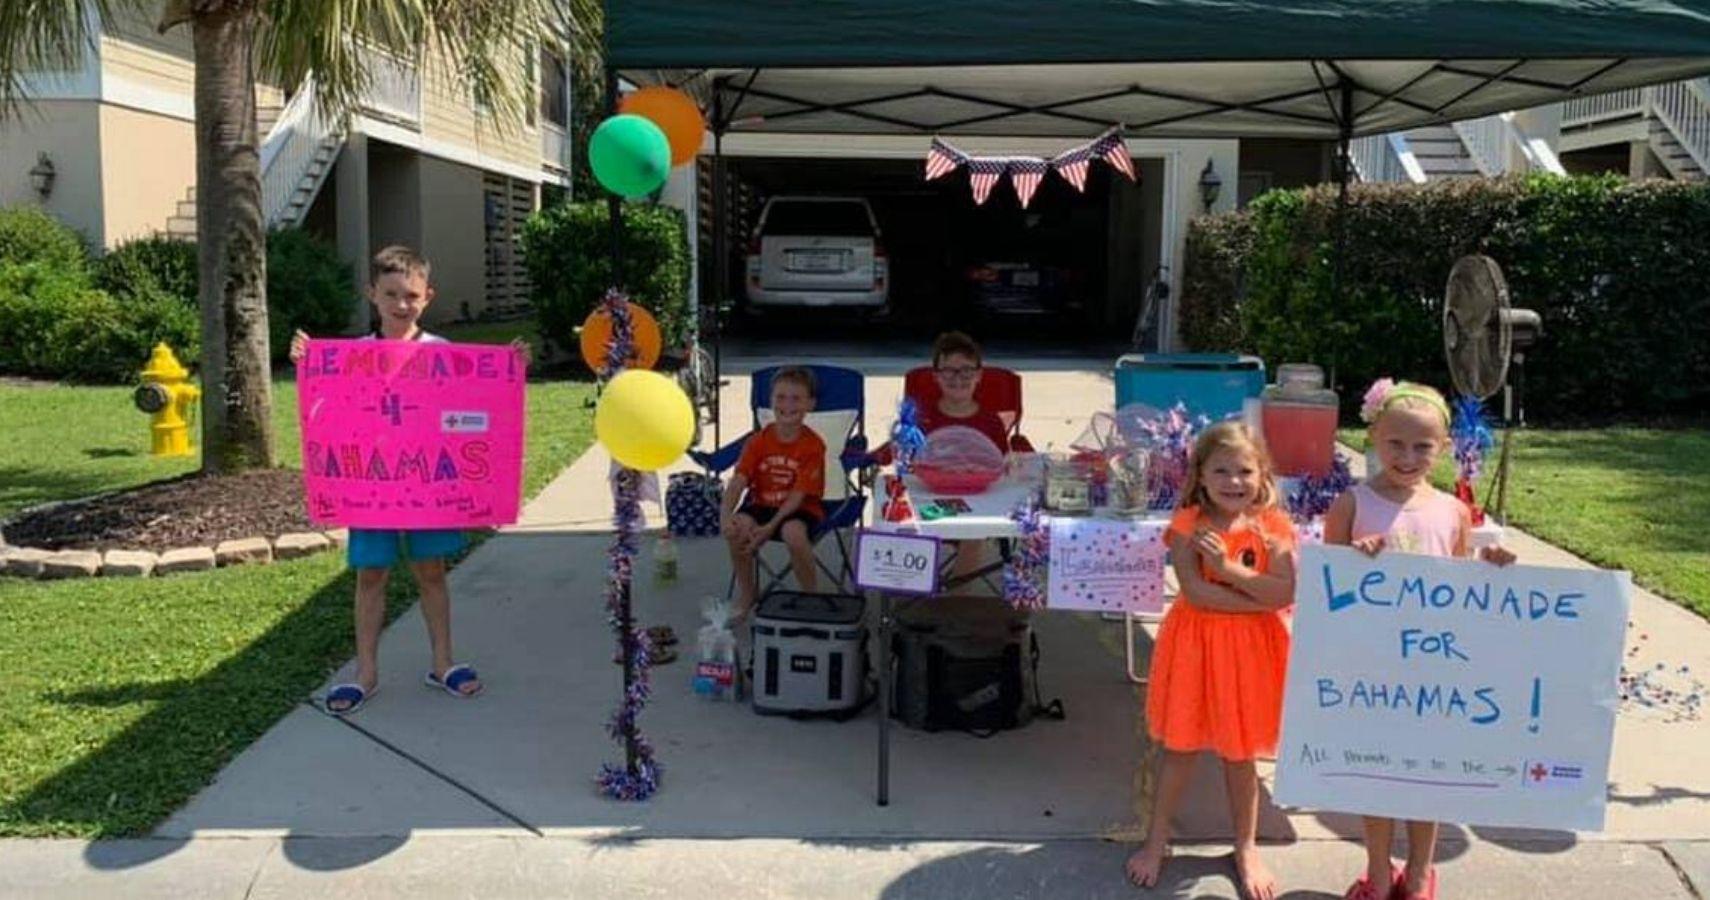 Hilton Head Children Raise $10 000 For Hurricane Dorian ...